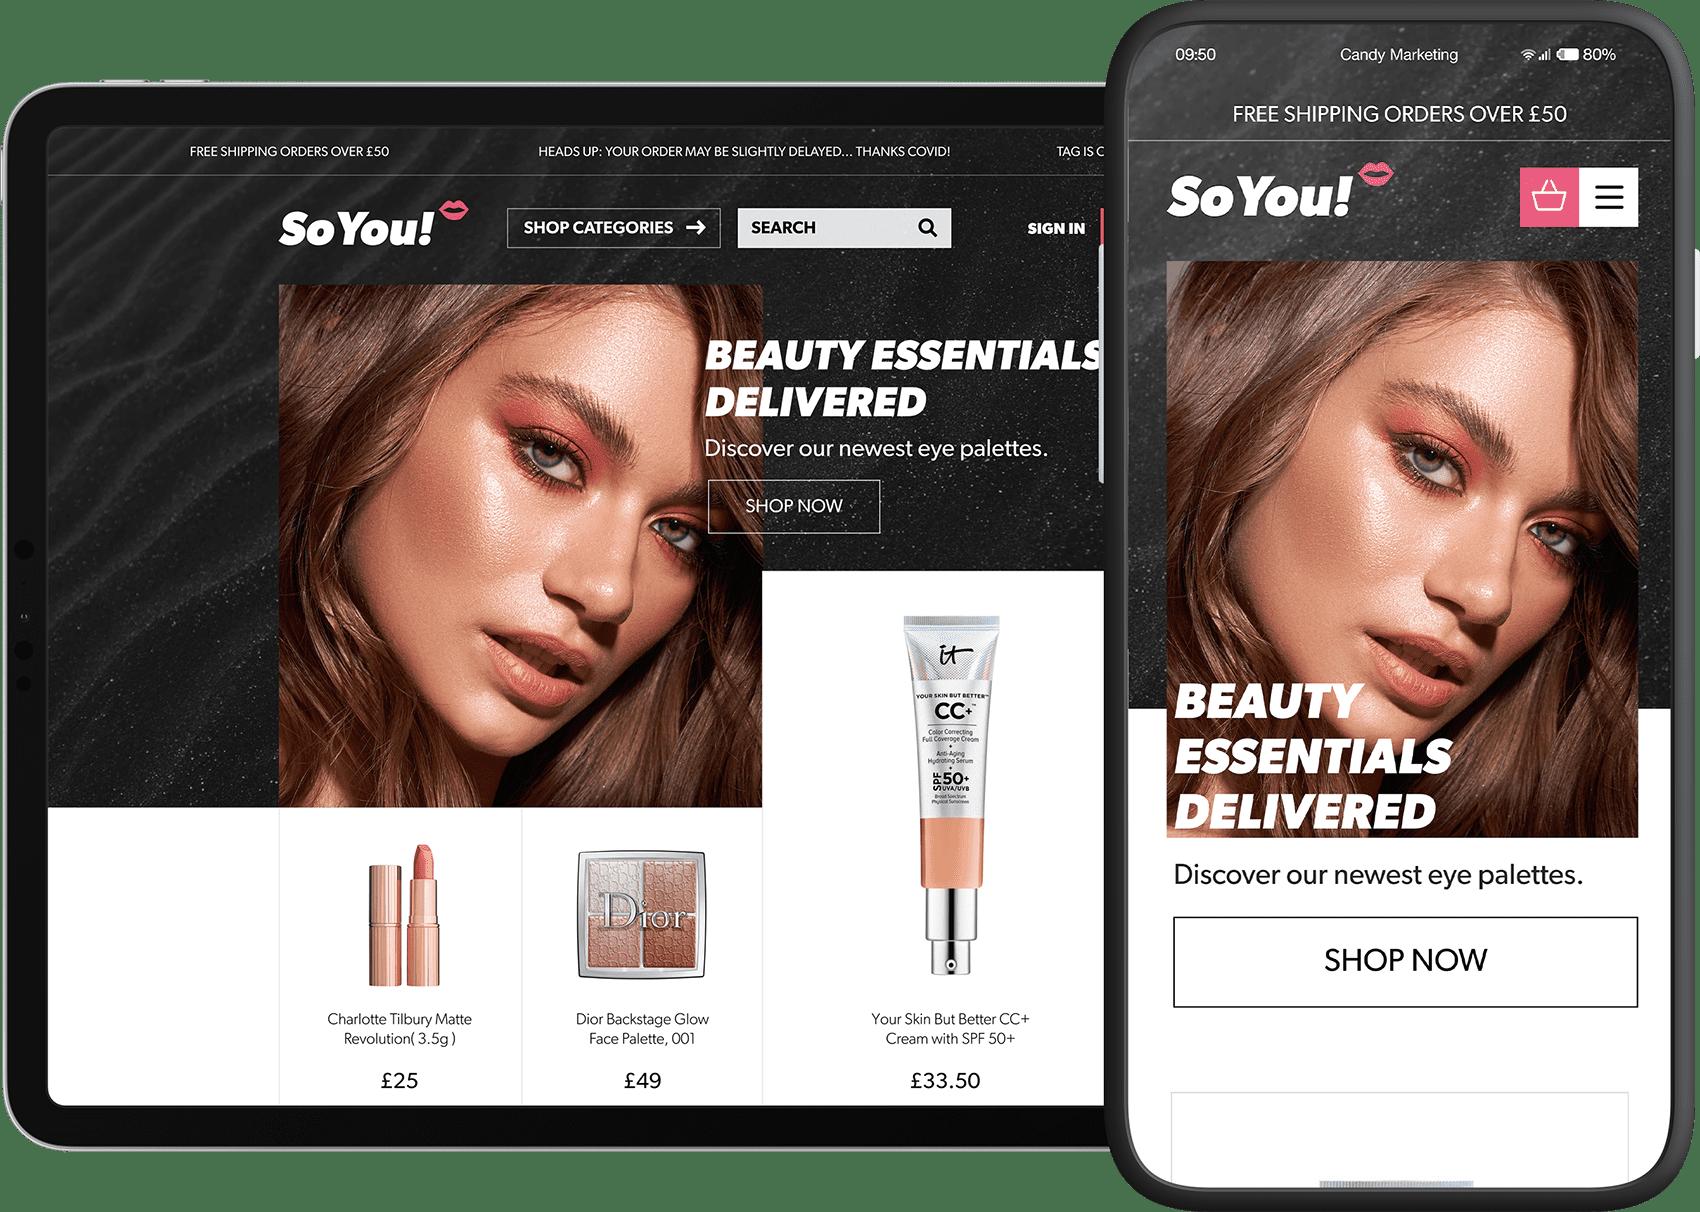 So You Website ScreenShot- Candy Marketing